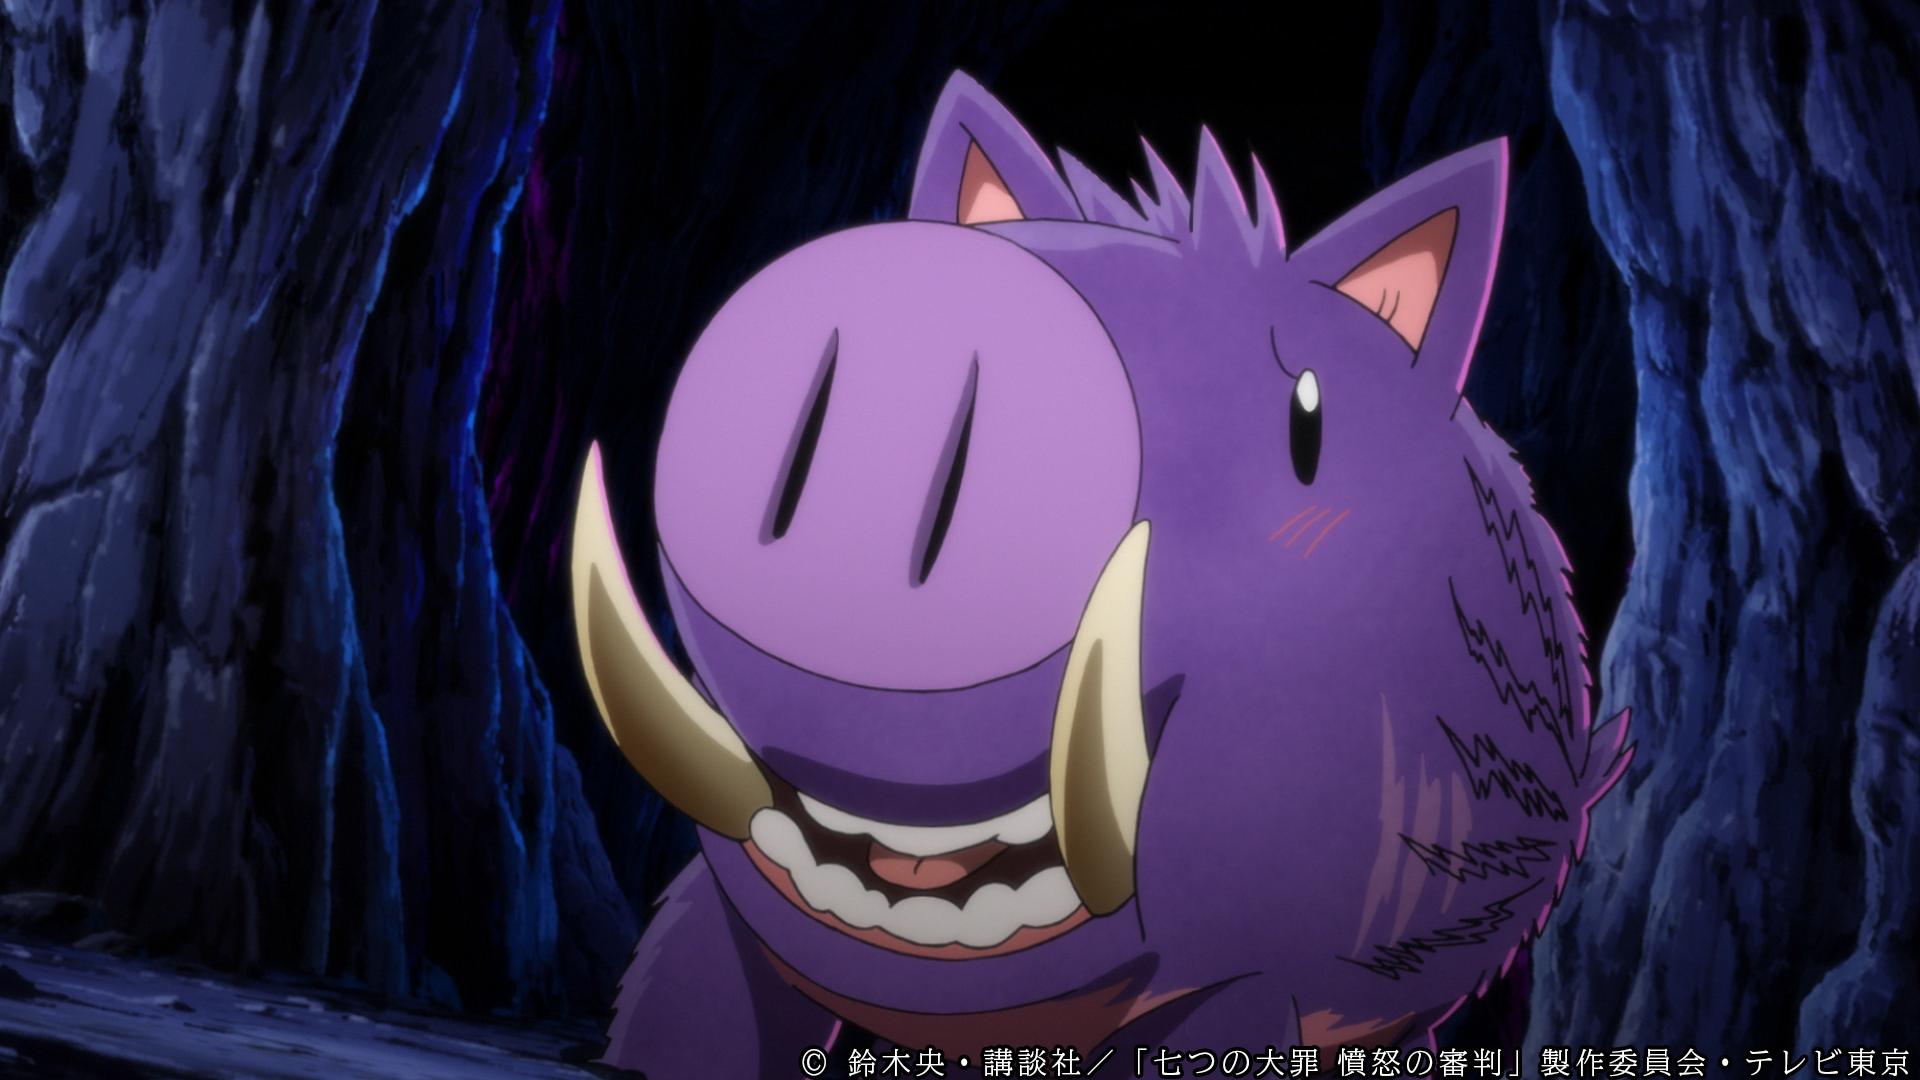 TVアニメ「七つの大罪 憤怒の審判」第2話「未知との遭遇」先行カット